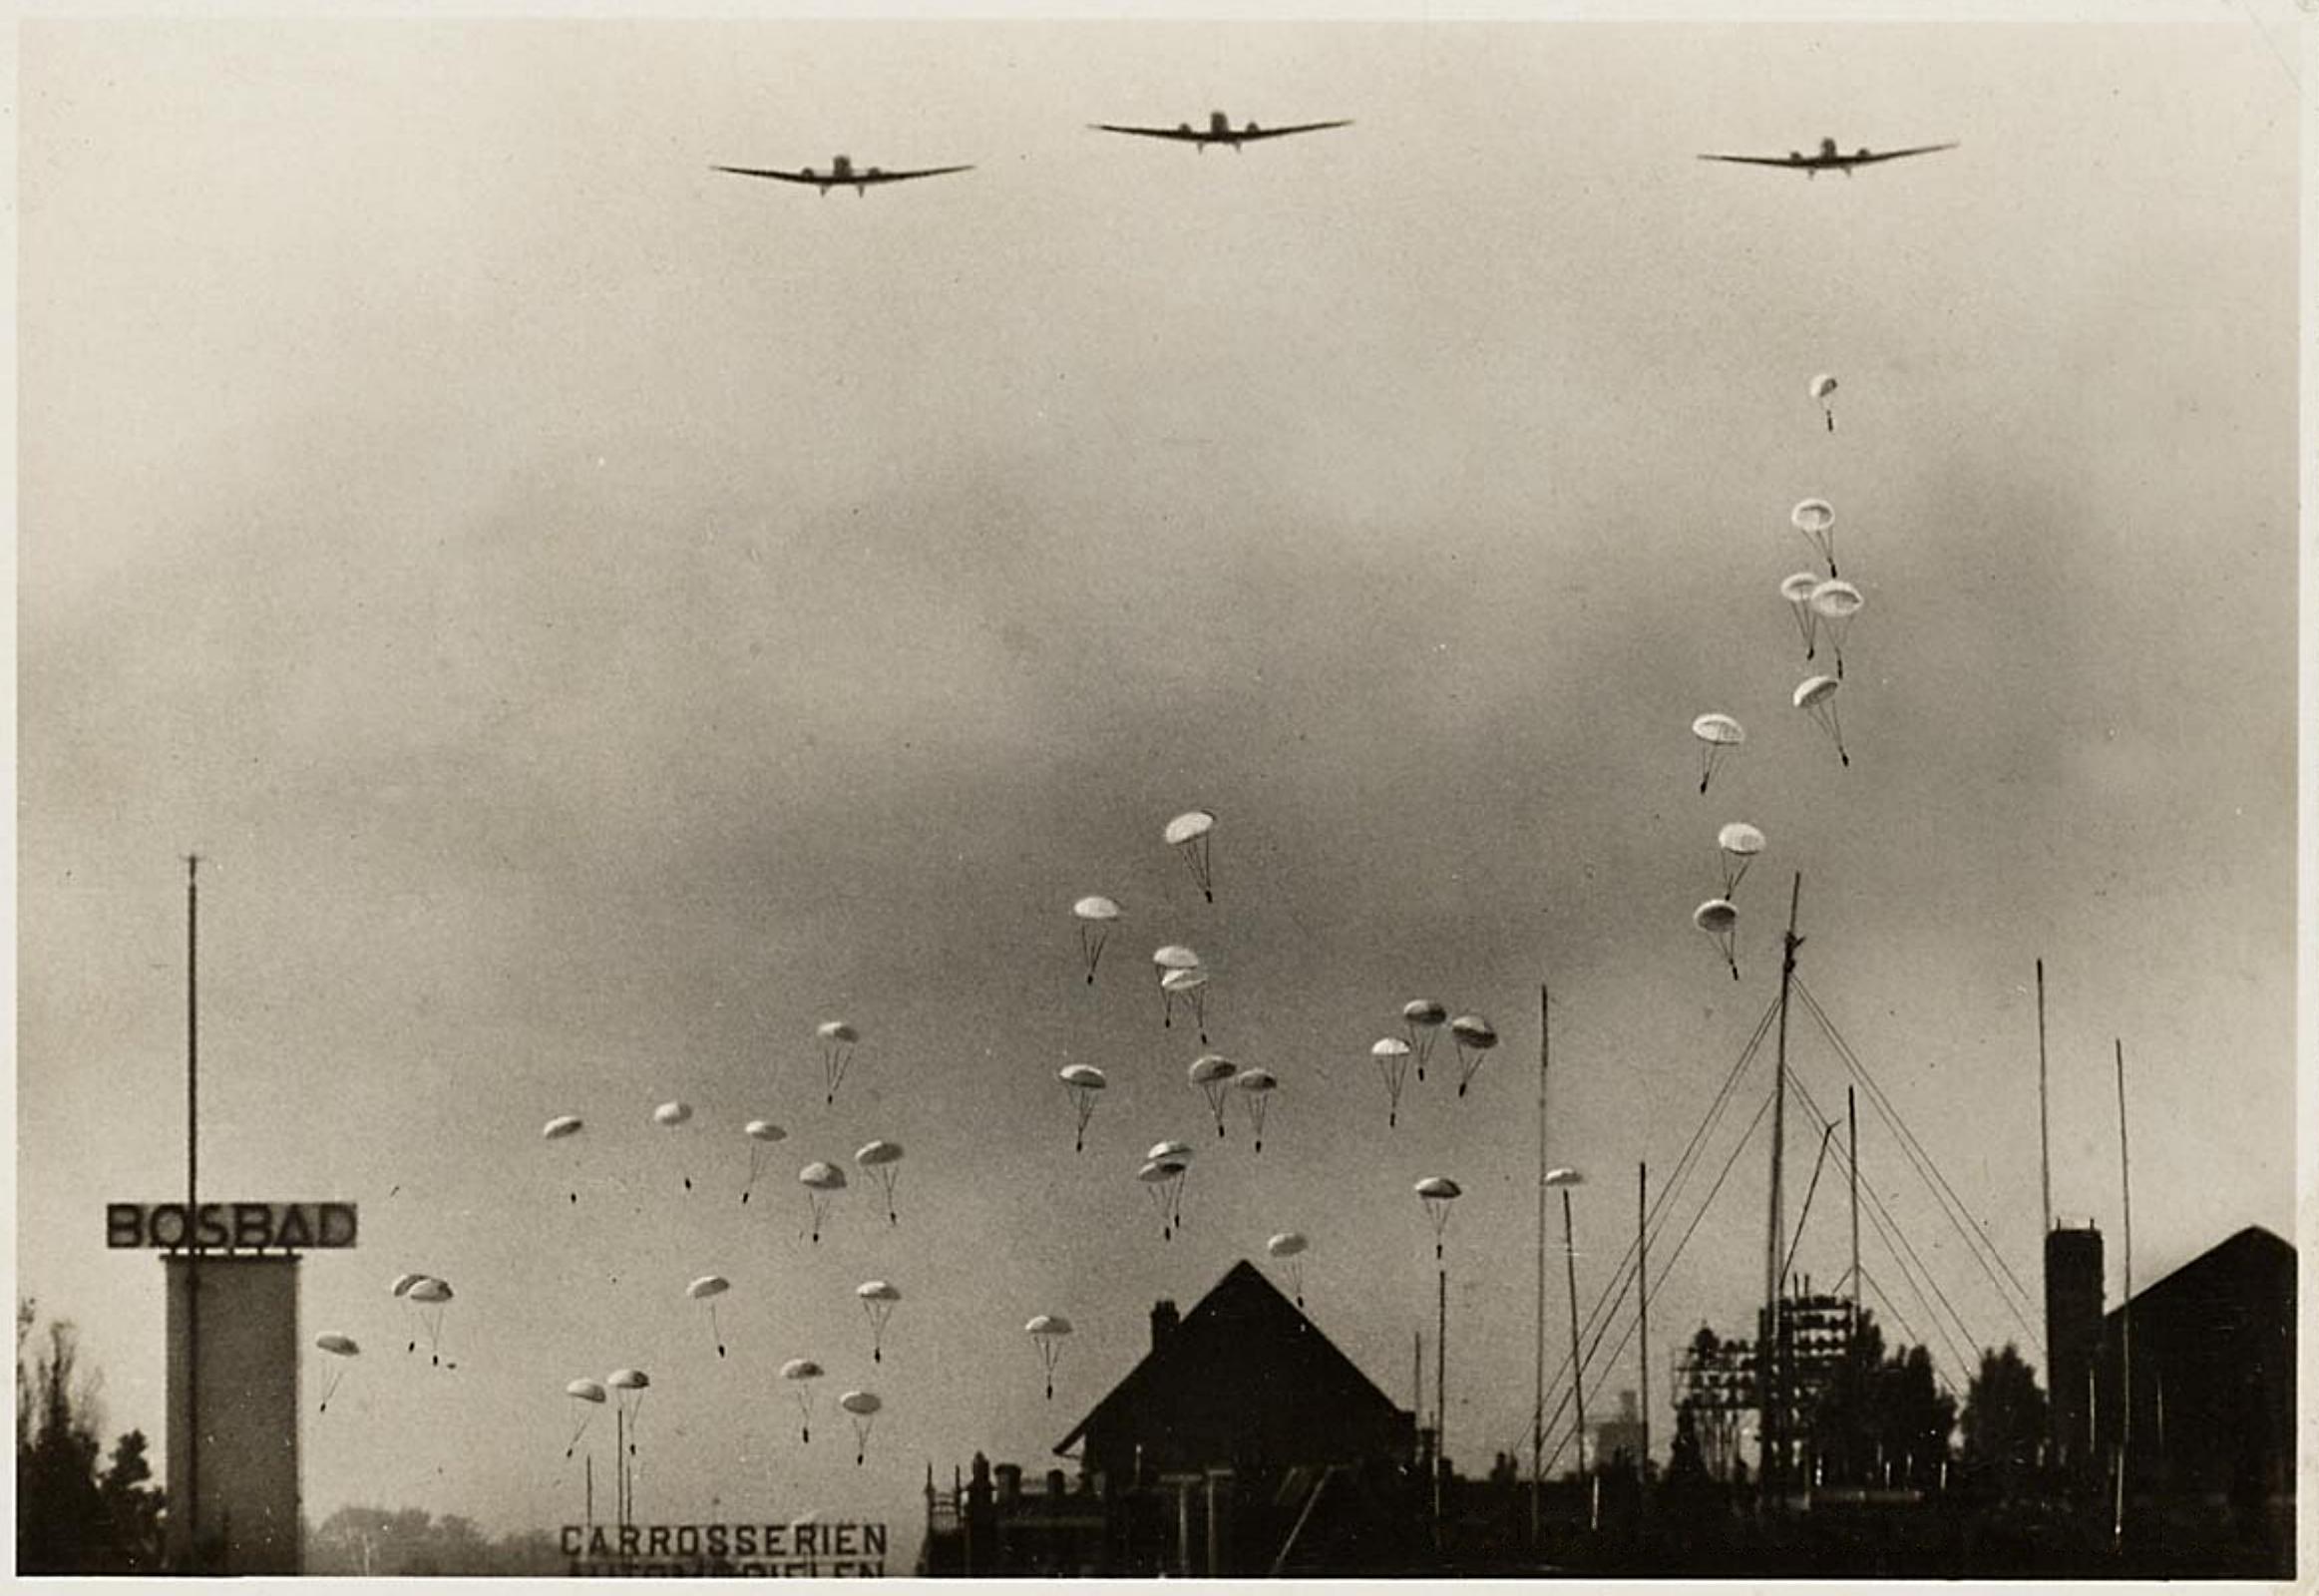 Bezuidenhout%2C_Den_Haag%2C_10_mei_1940%2C_Duitse_parachutisten.png